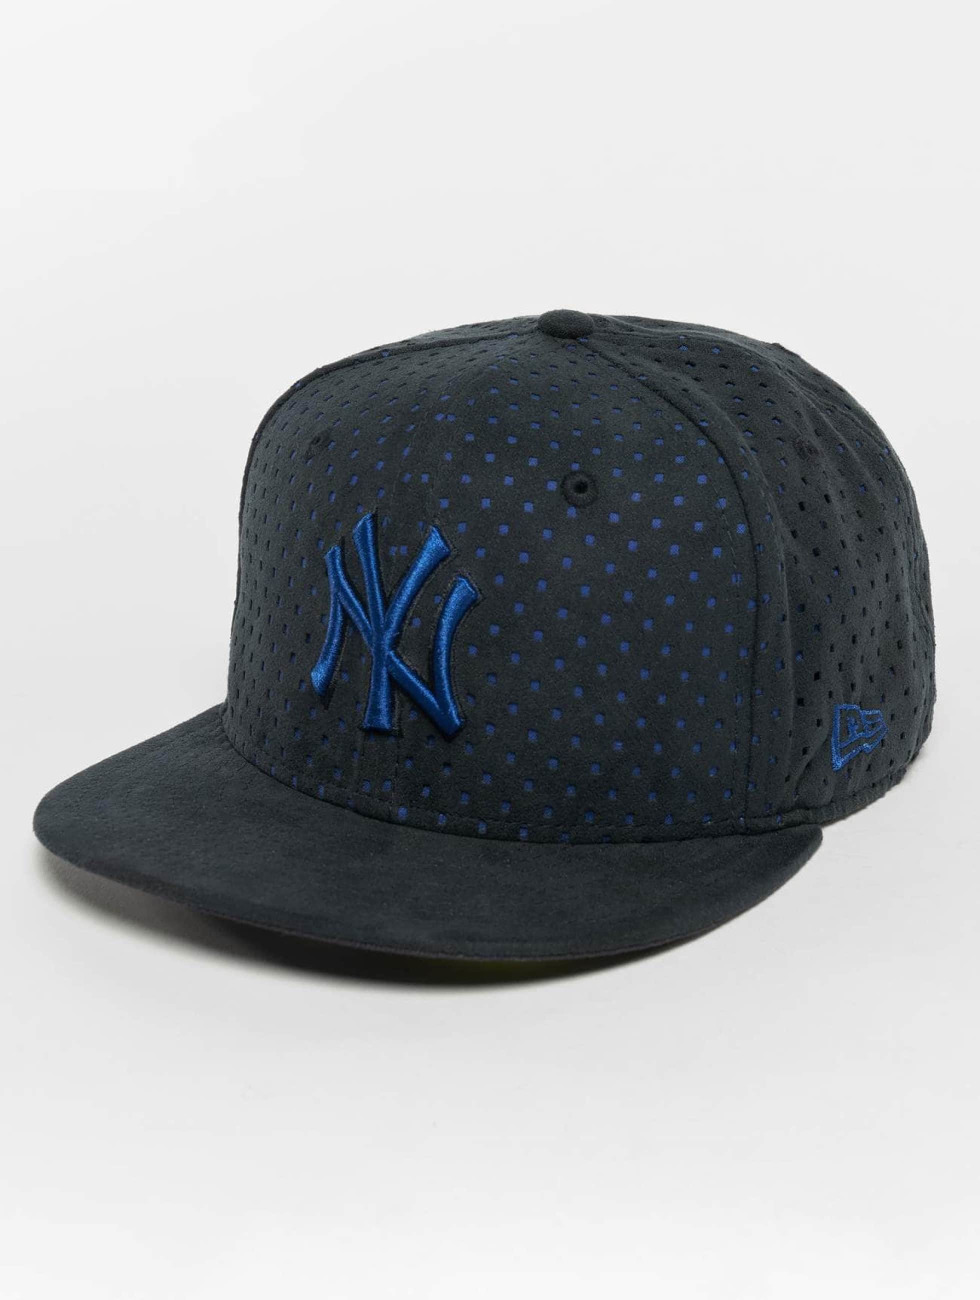 New Era Gorra plana Suede Perf NY Yankees 59Fifty azul